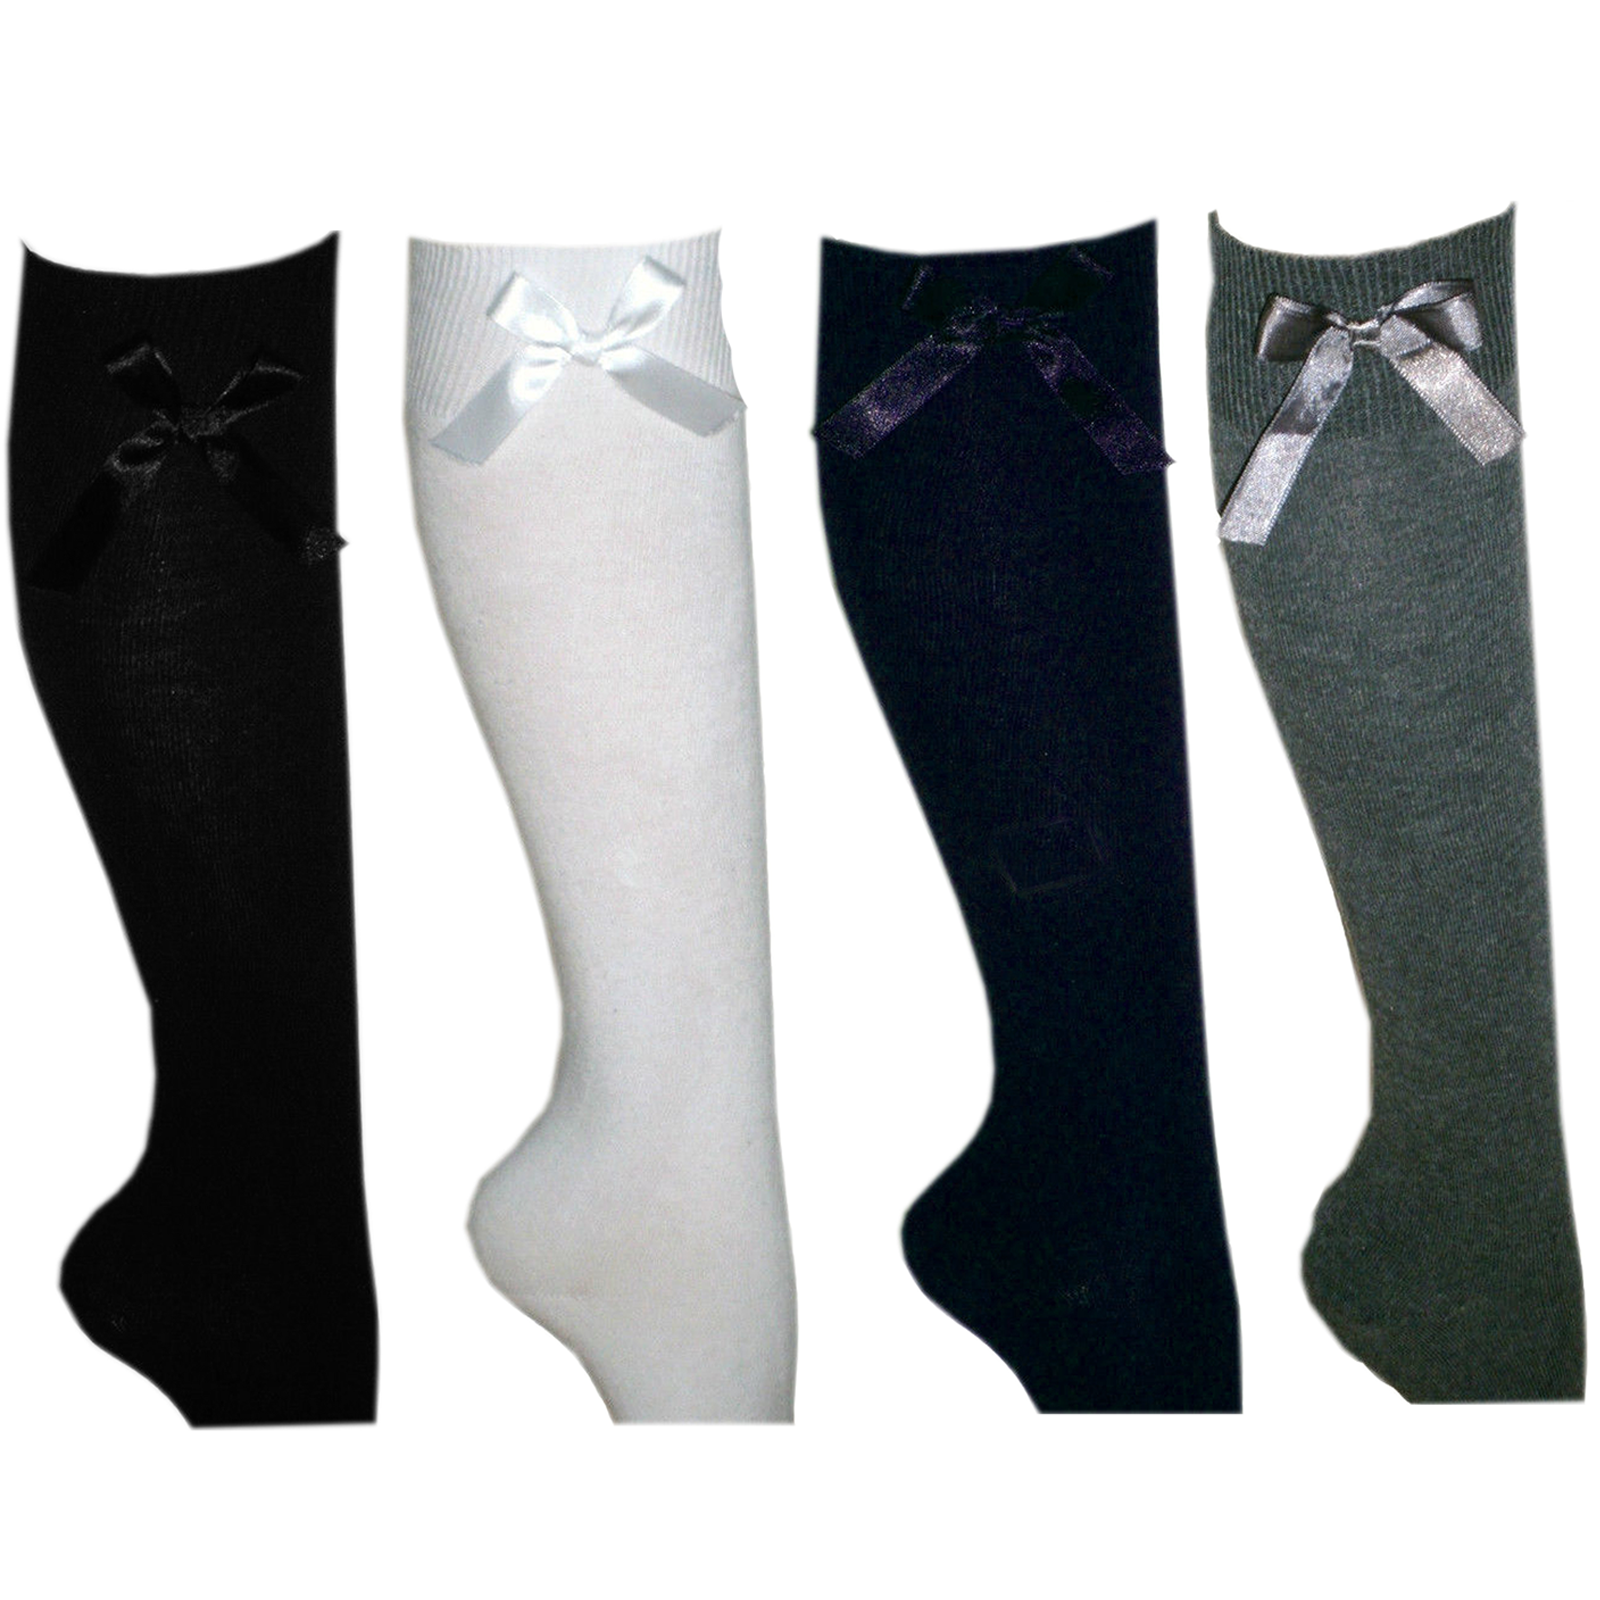 New Girls Fashion Cotton Knee High Children Kids Back to School Socks 6-9-12